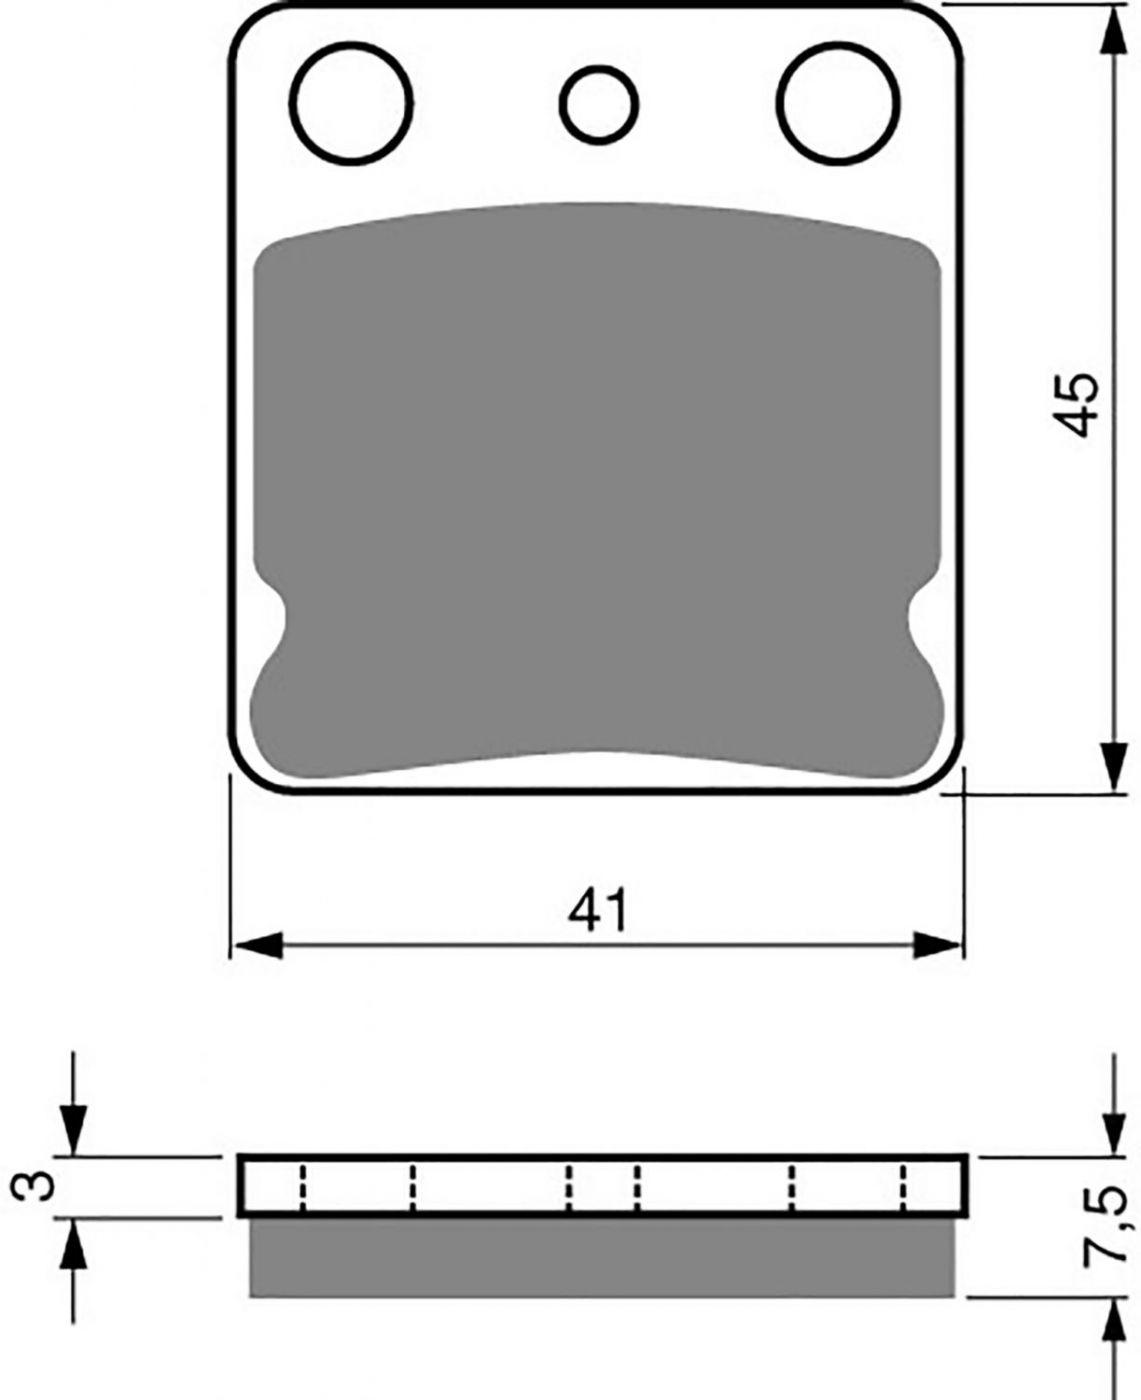 Goldfren K1 Pads (Sand & Mud) - 700144GO image